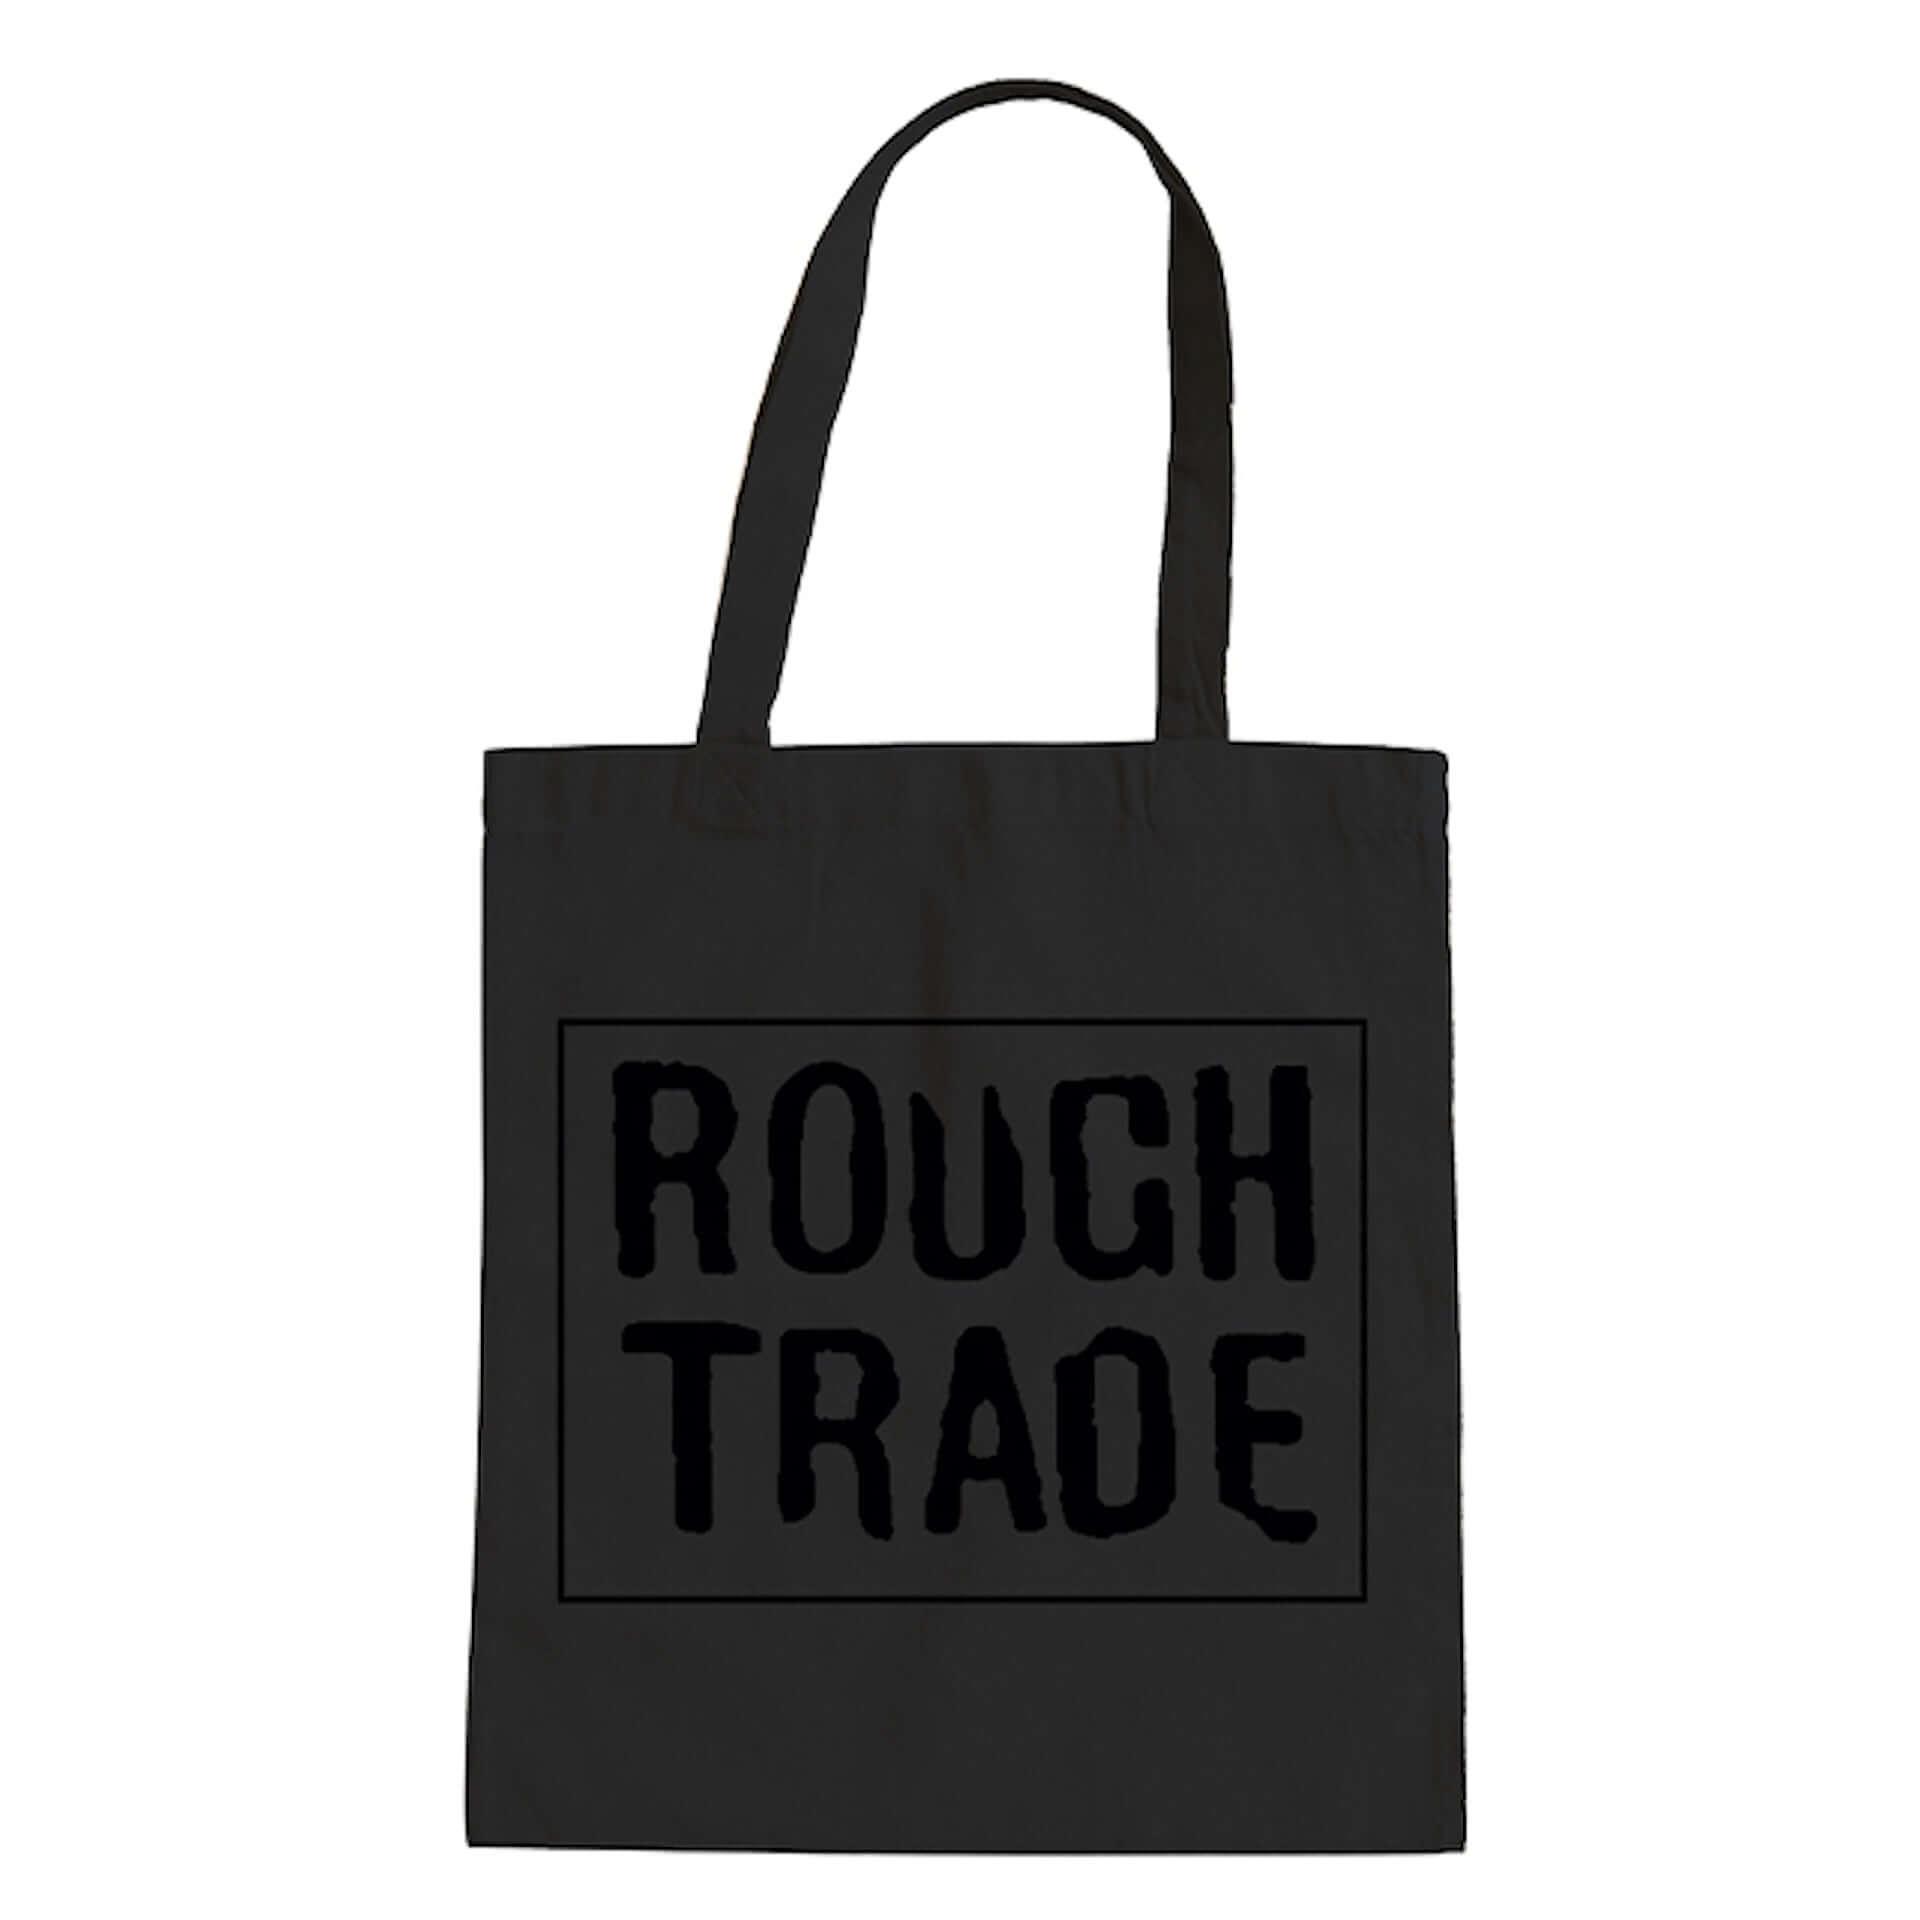 〈Rough Trade Records〉の特別展示が代官山蔦屋書店にて開催決定!ジェフ・トラヴィスが選んだ名盤など展示&新作グッズも販売 music201015_roughtrade-tsite_8-1920x1920